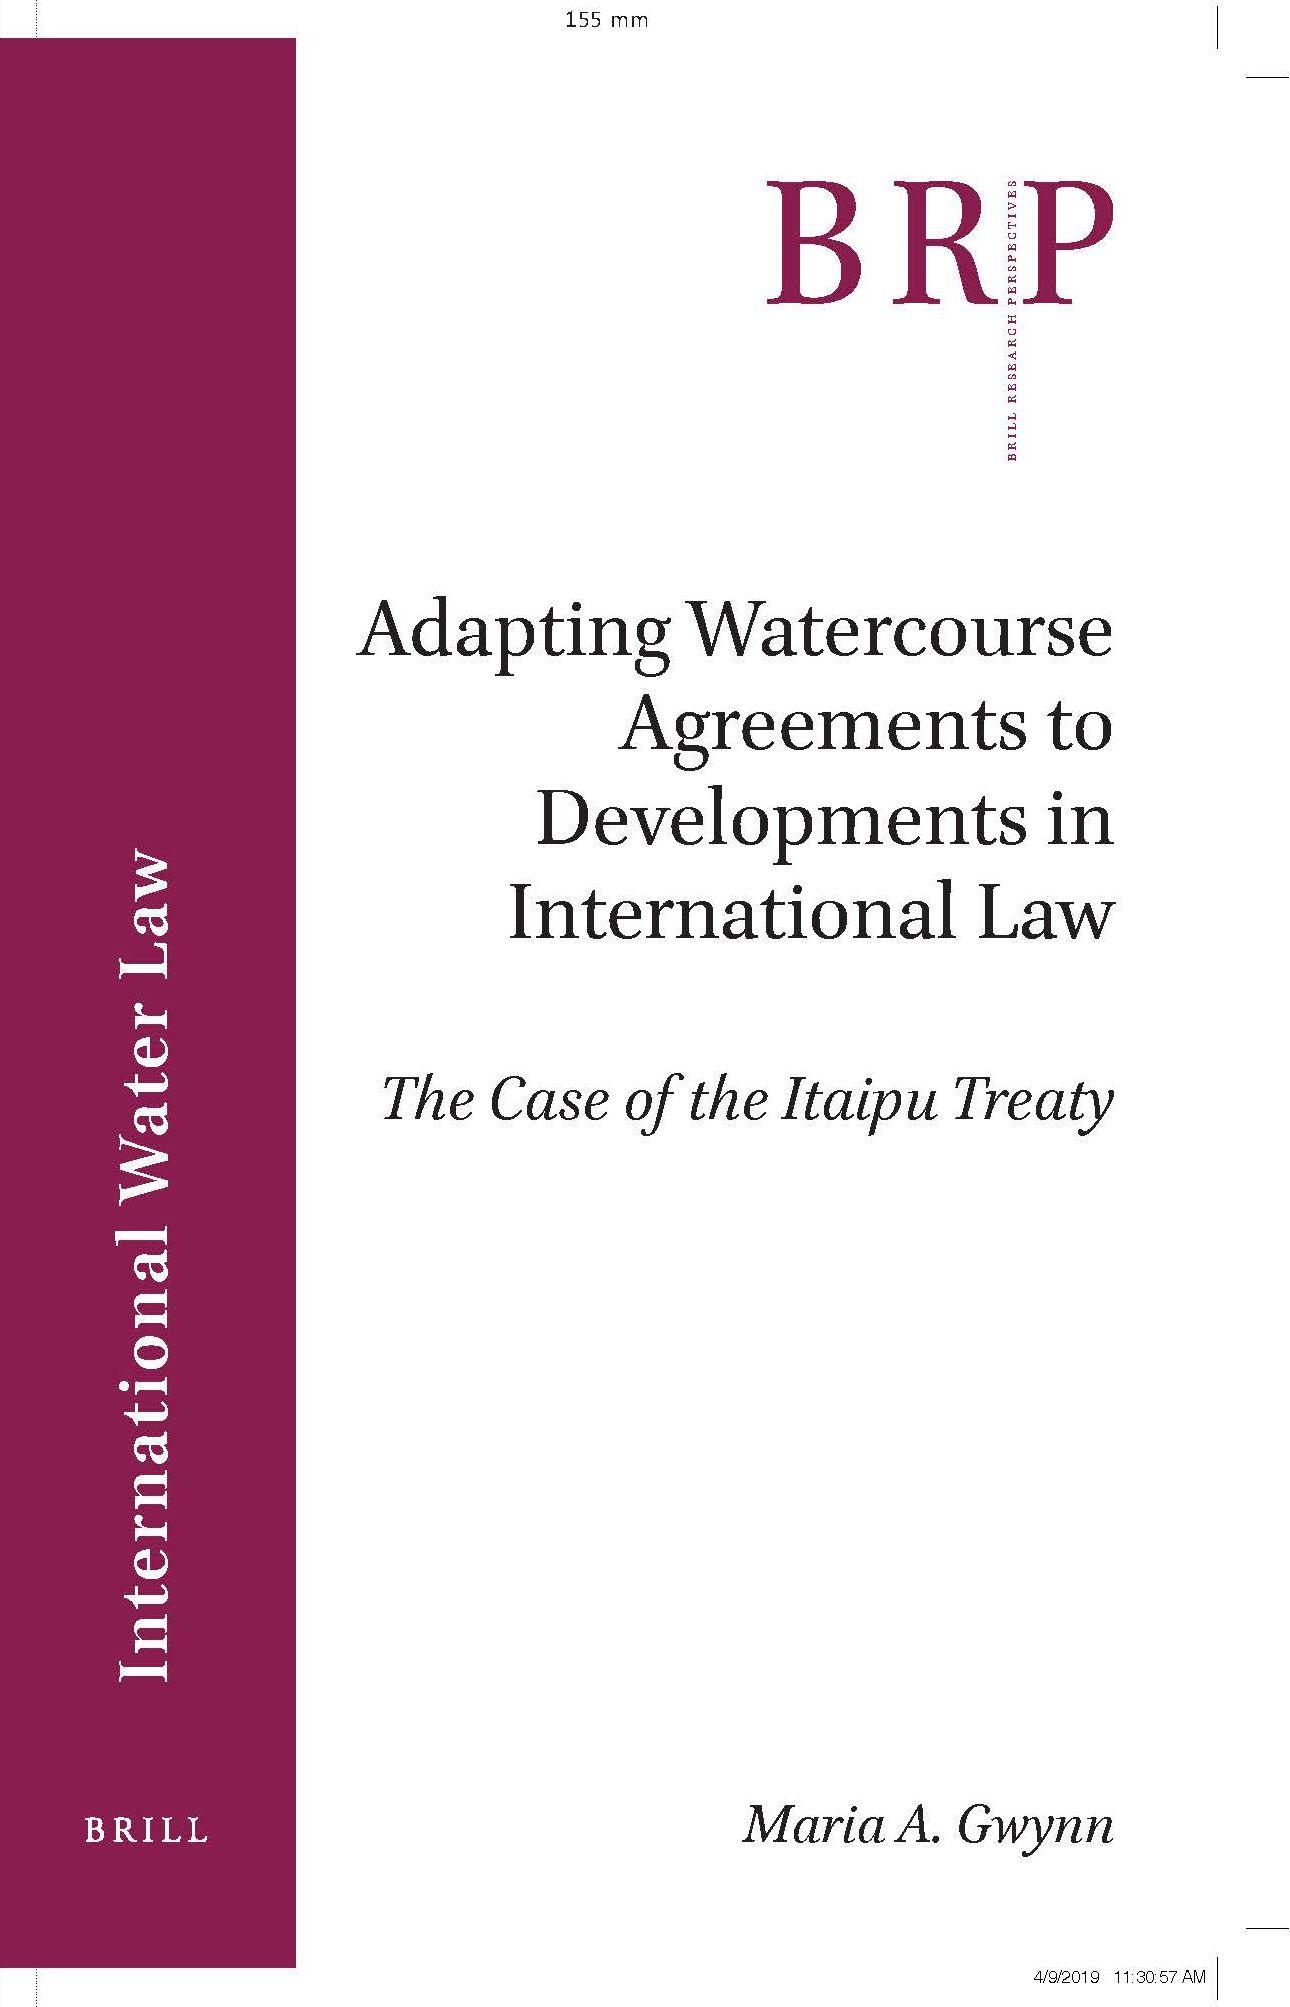 International Water Law Project Blog International Water Law Project